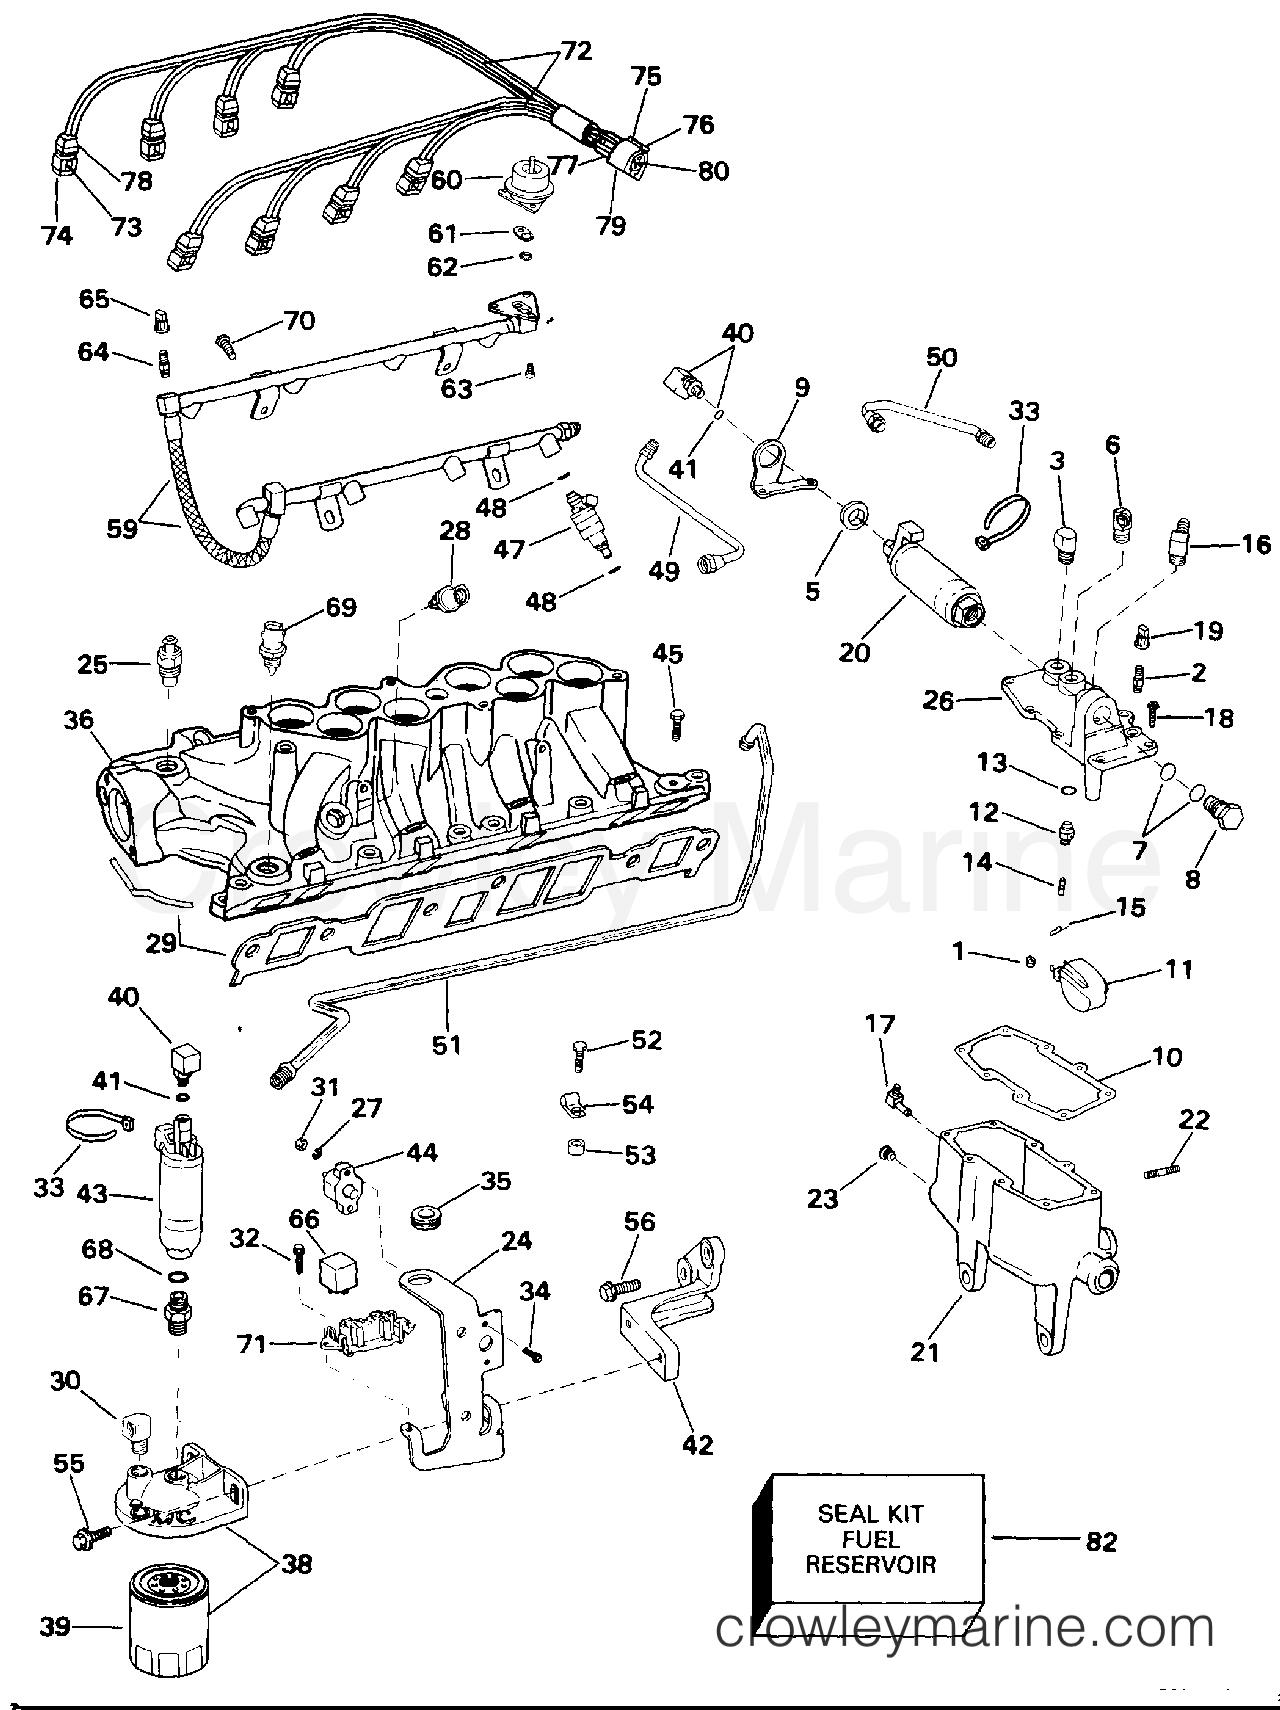 1994 OMC Stern Drive 5.8 - 58FAGPMDM - FUEL SYSTEM & LOWER INTAKE MANIFOLD